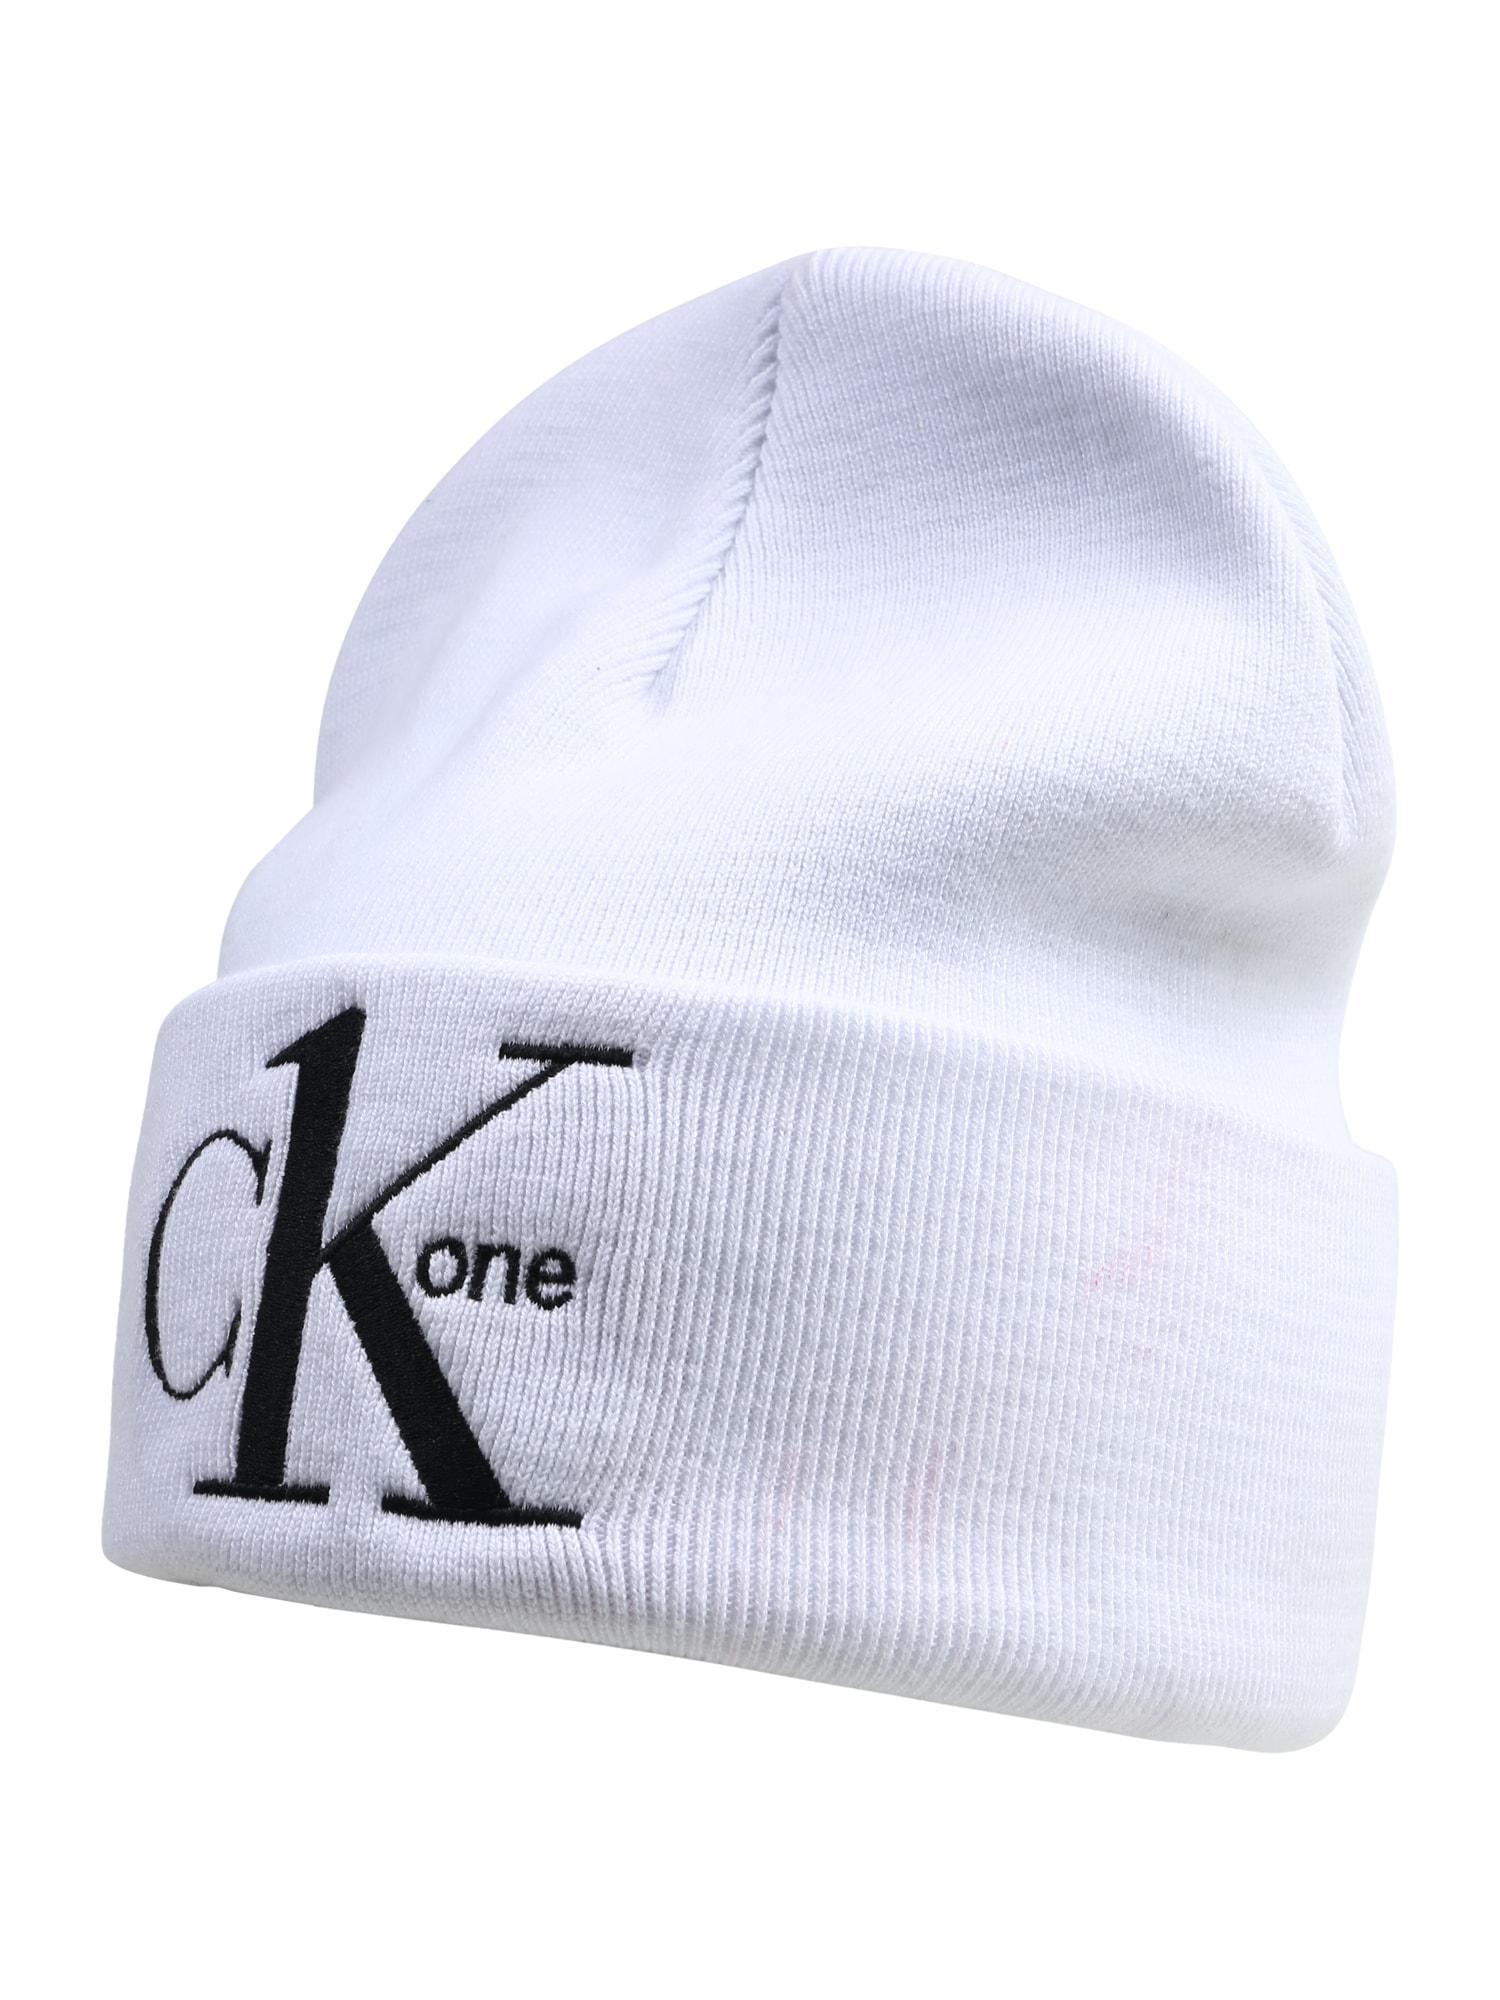 Calvin Klein Jeans Megzta kepurė 'CK1' juoda / balta